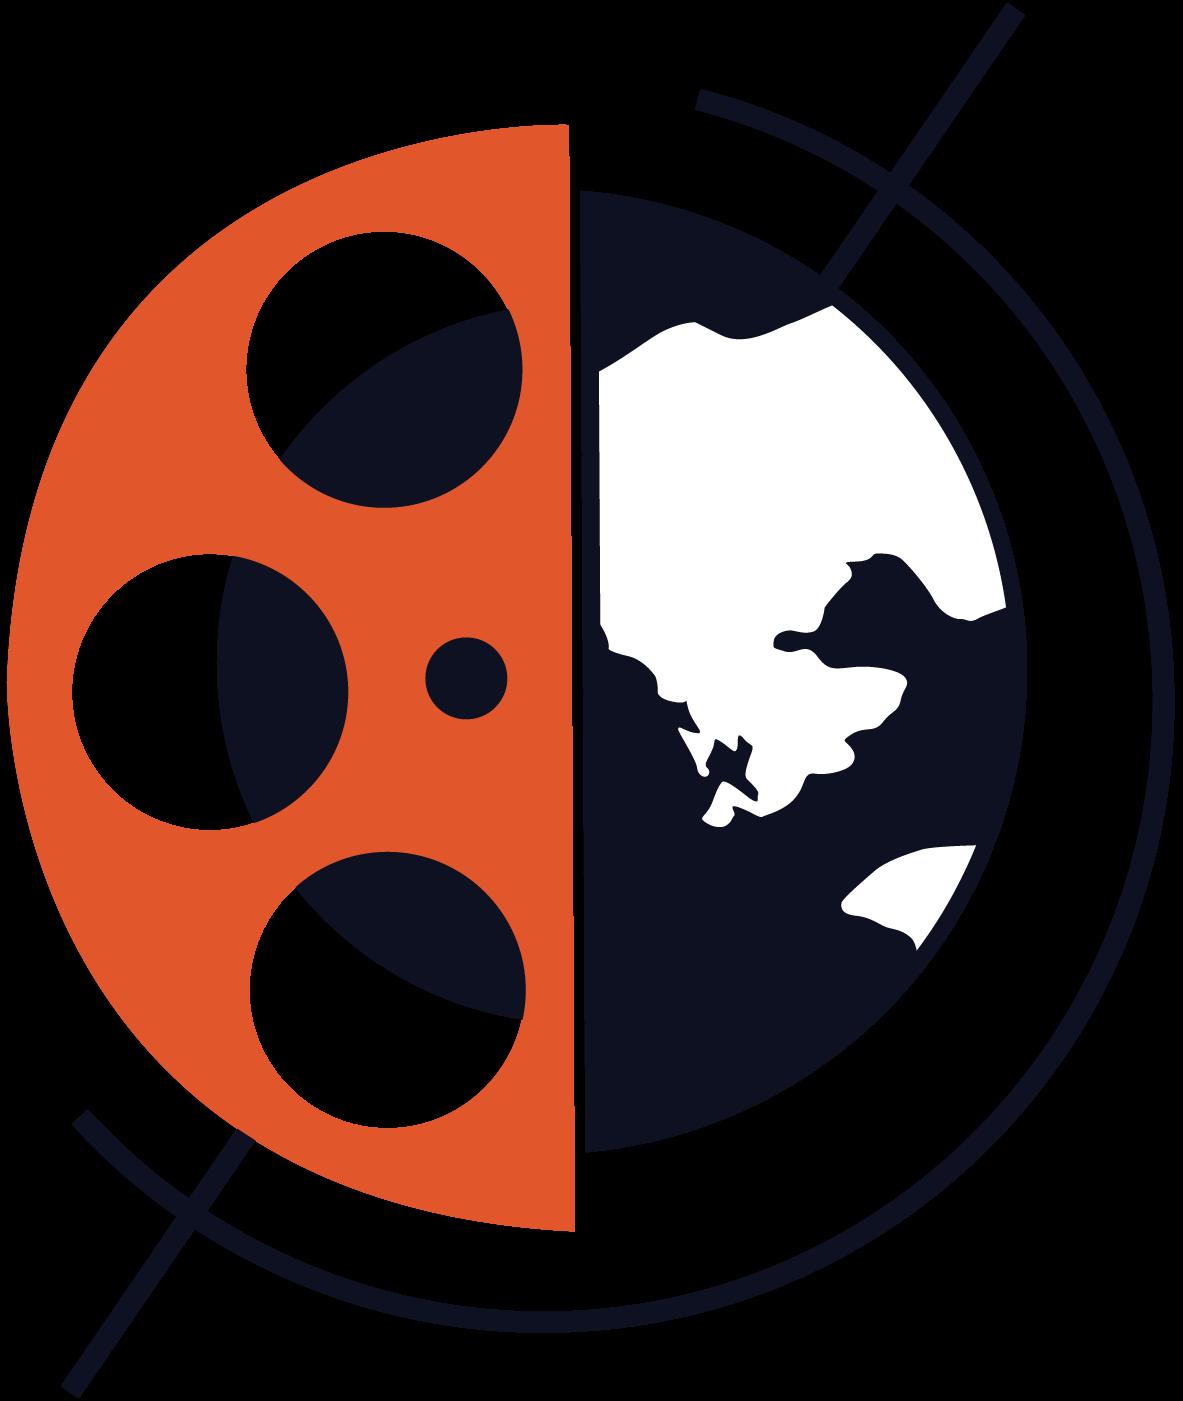 Transkulturelles Ethnographisches Kino